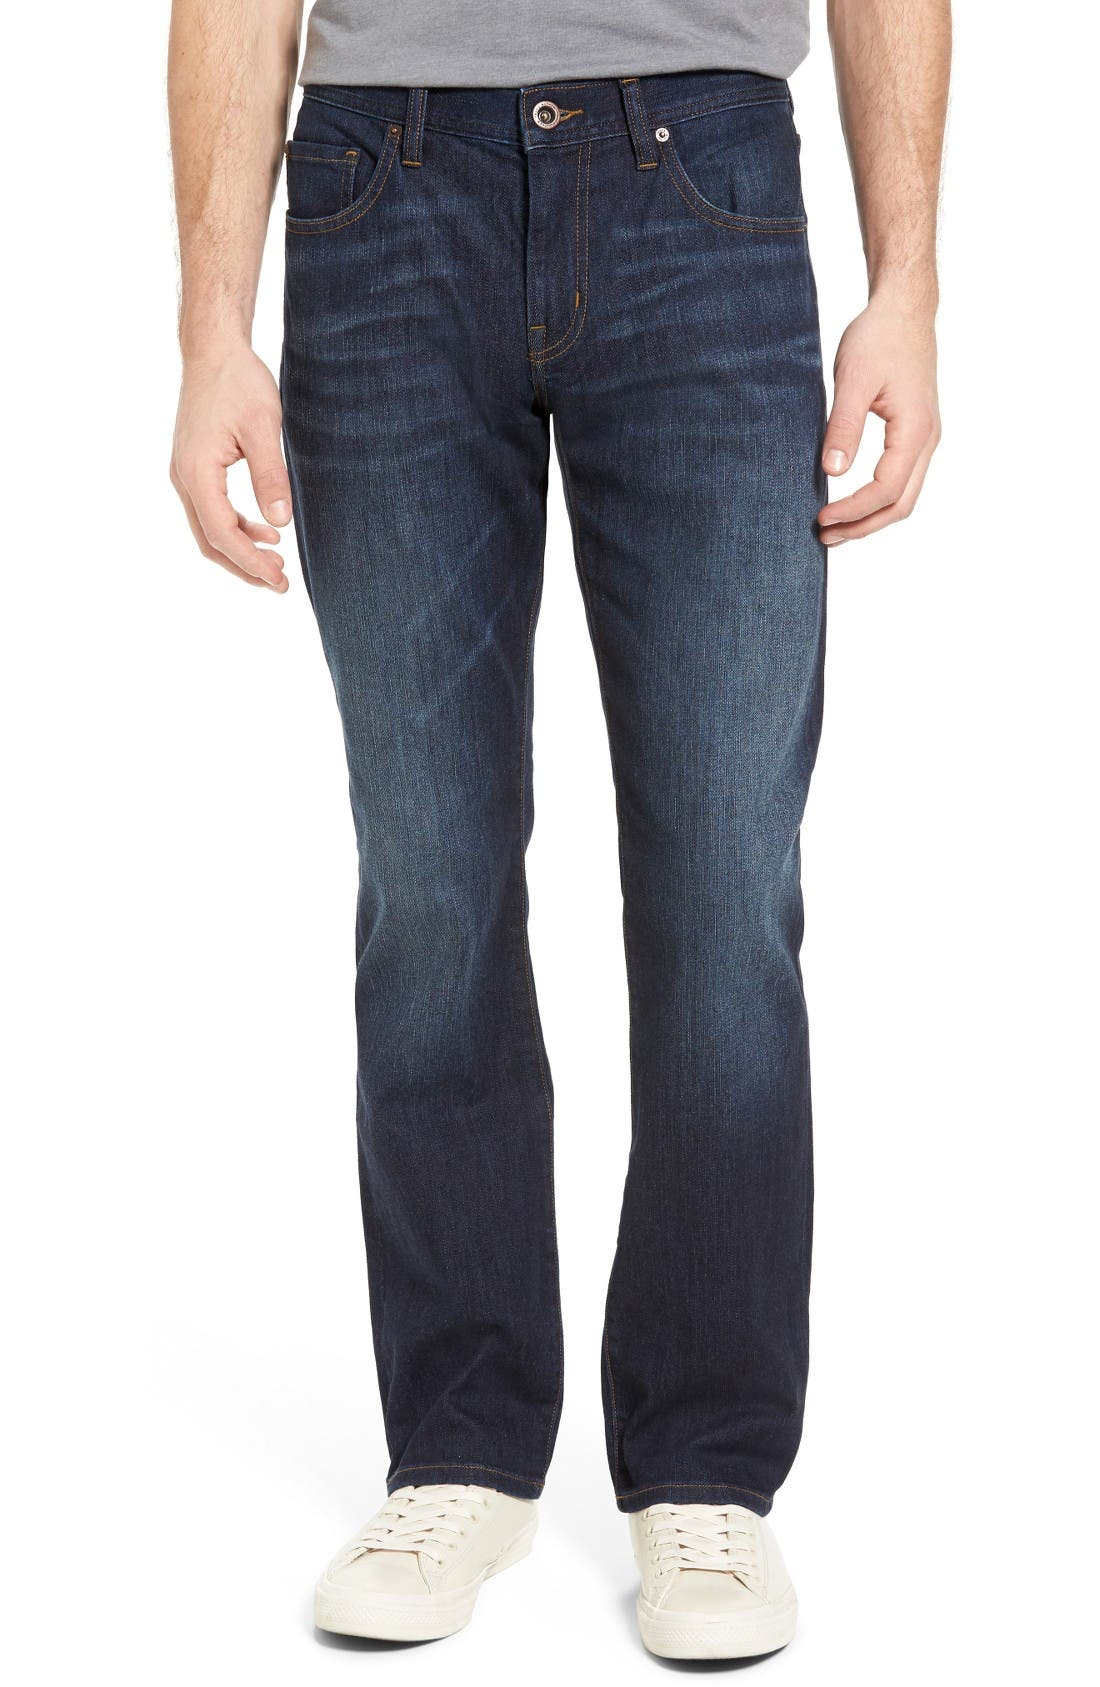 Main Image - Travis Mathew 'Duke' Relaxed Fit Jeans (Vintage Indigo)